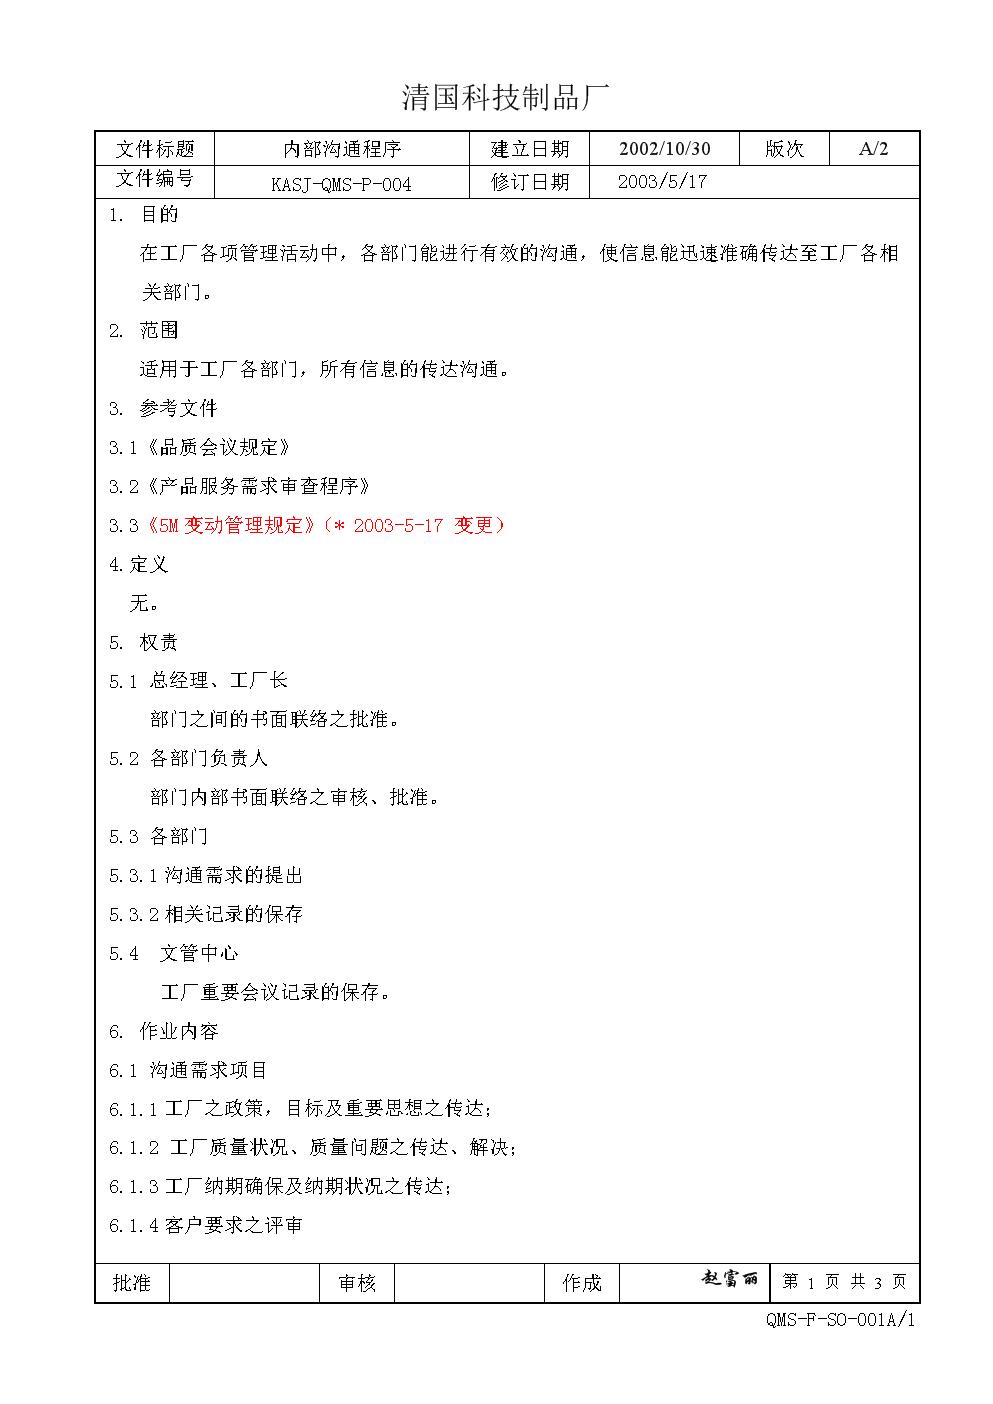 KASJ-QMS-P-004内部沟通程序.doc